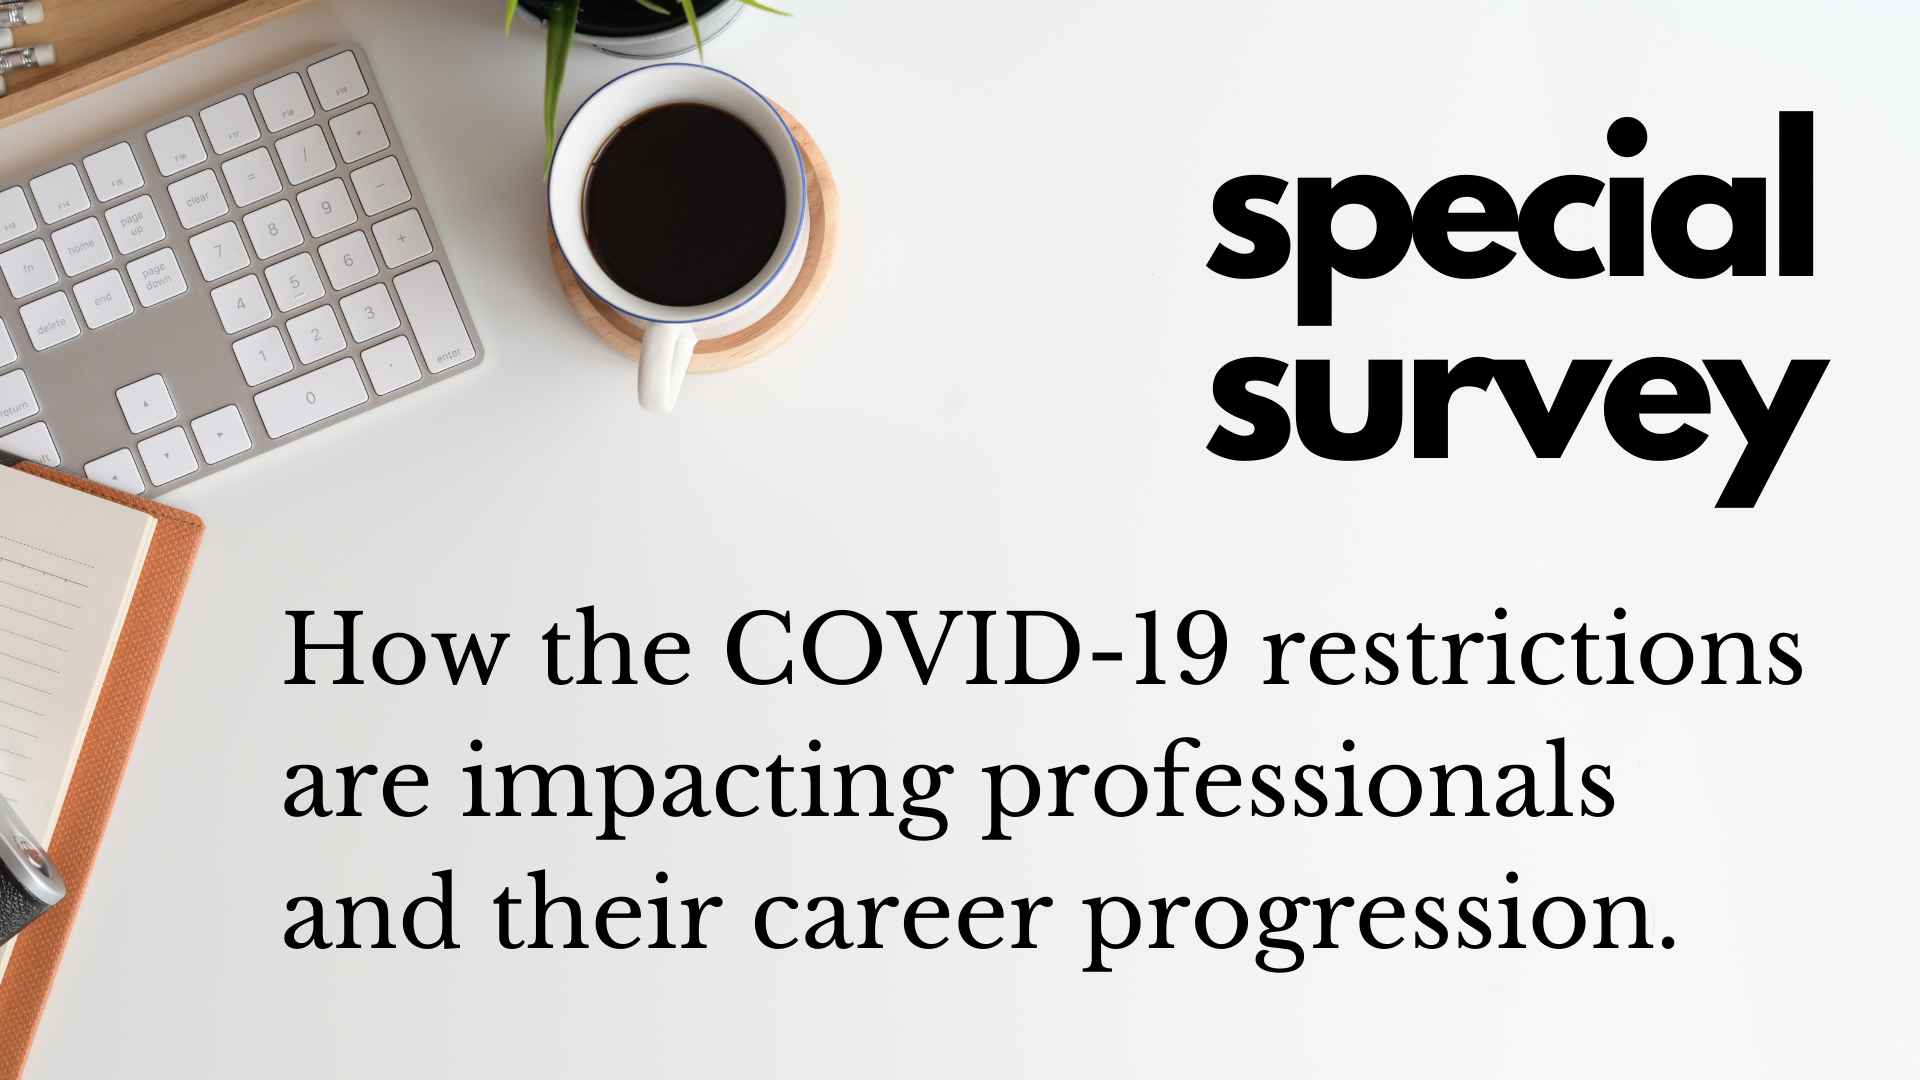 Special Survey Job Hunters COVID-19